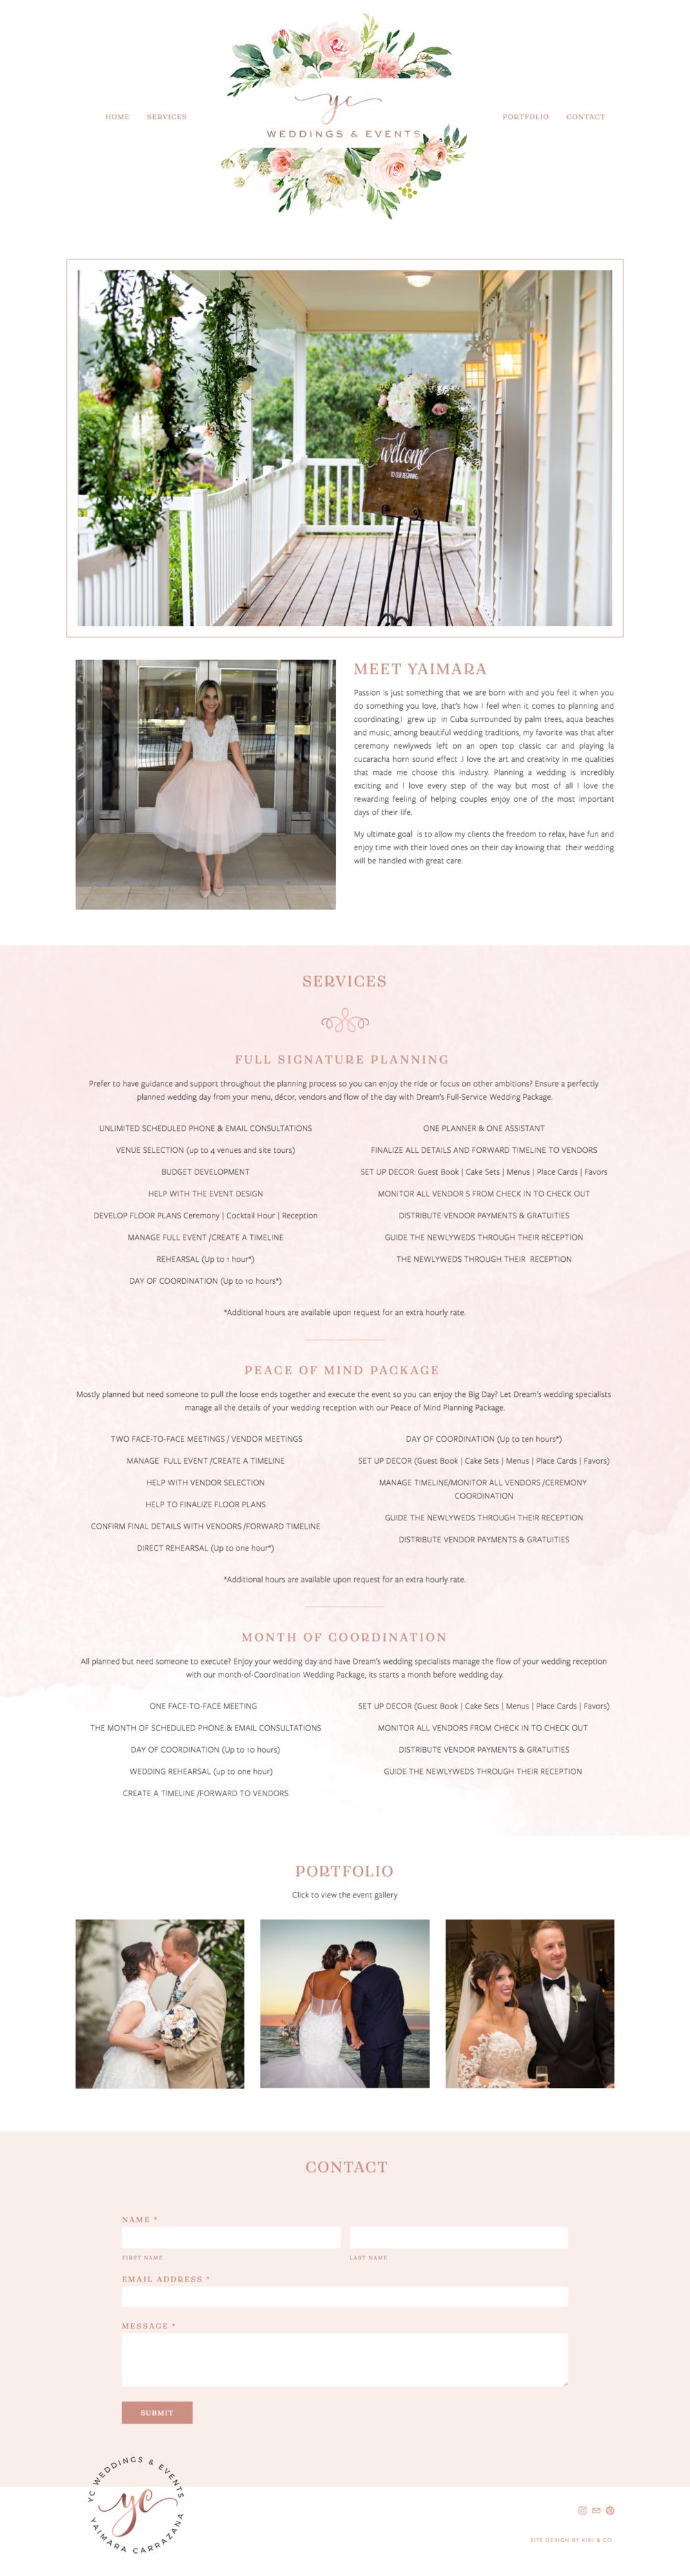 YC Weddings & Events Squarespace Platform Website Design by Kiki & Co.